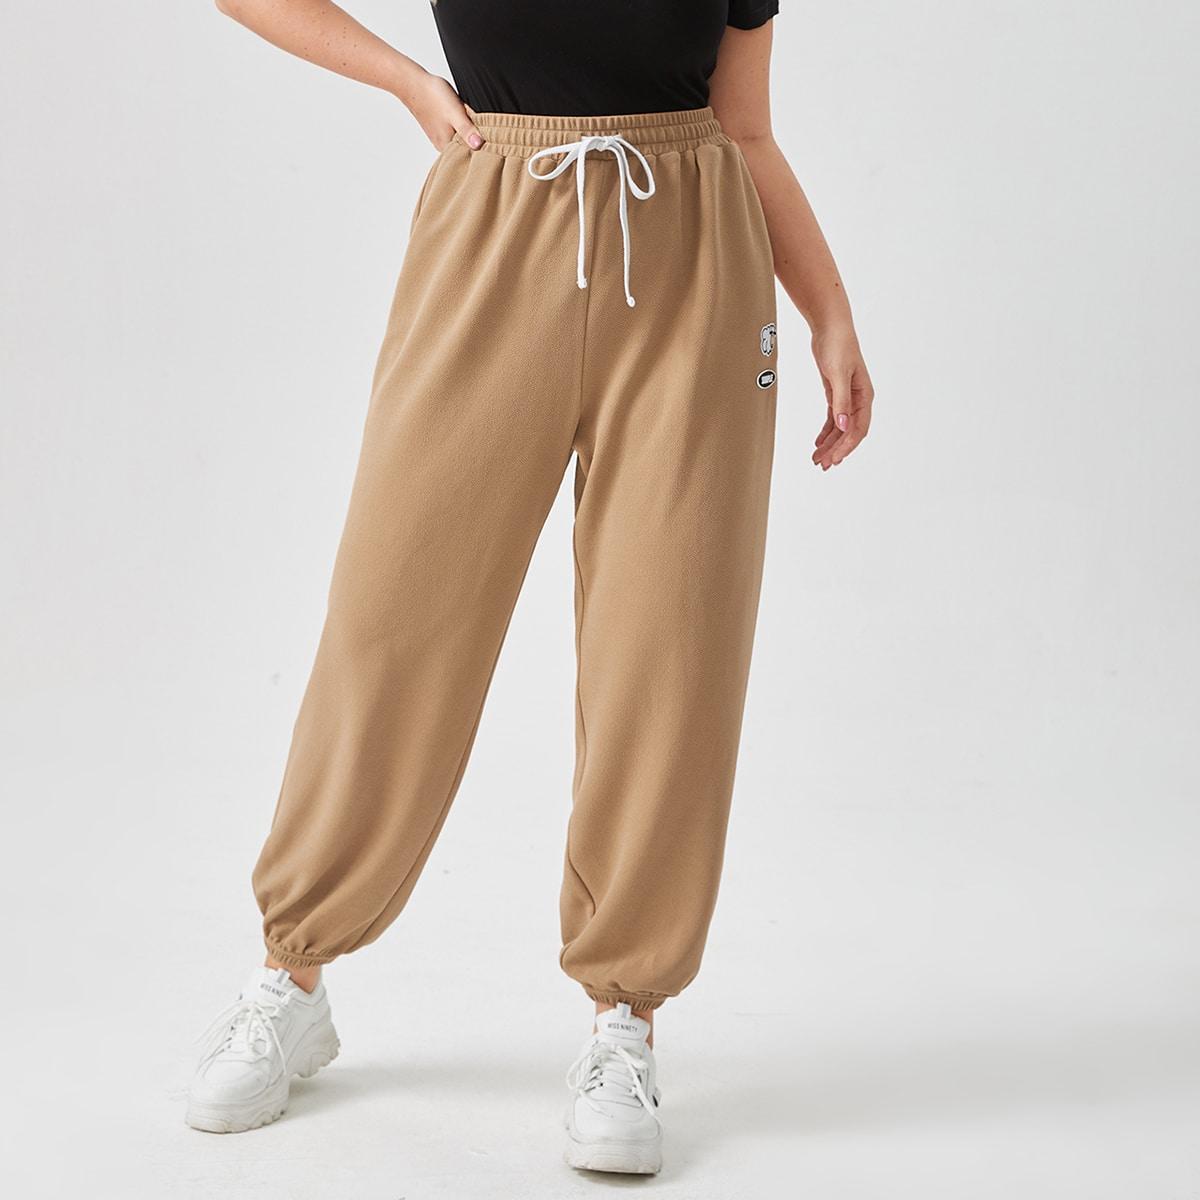 Pantalones Joggers en Tallas Grandes Cordón Parches Bolsillo Dibujos animados Letras